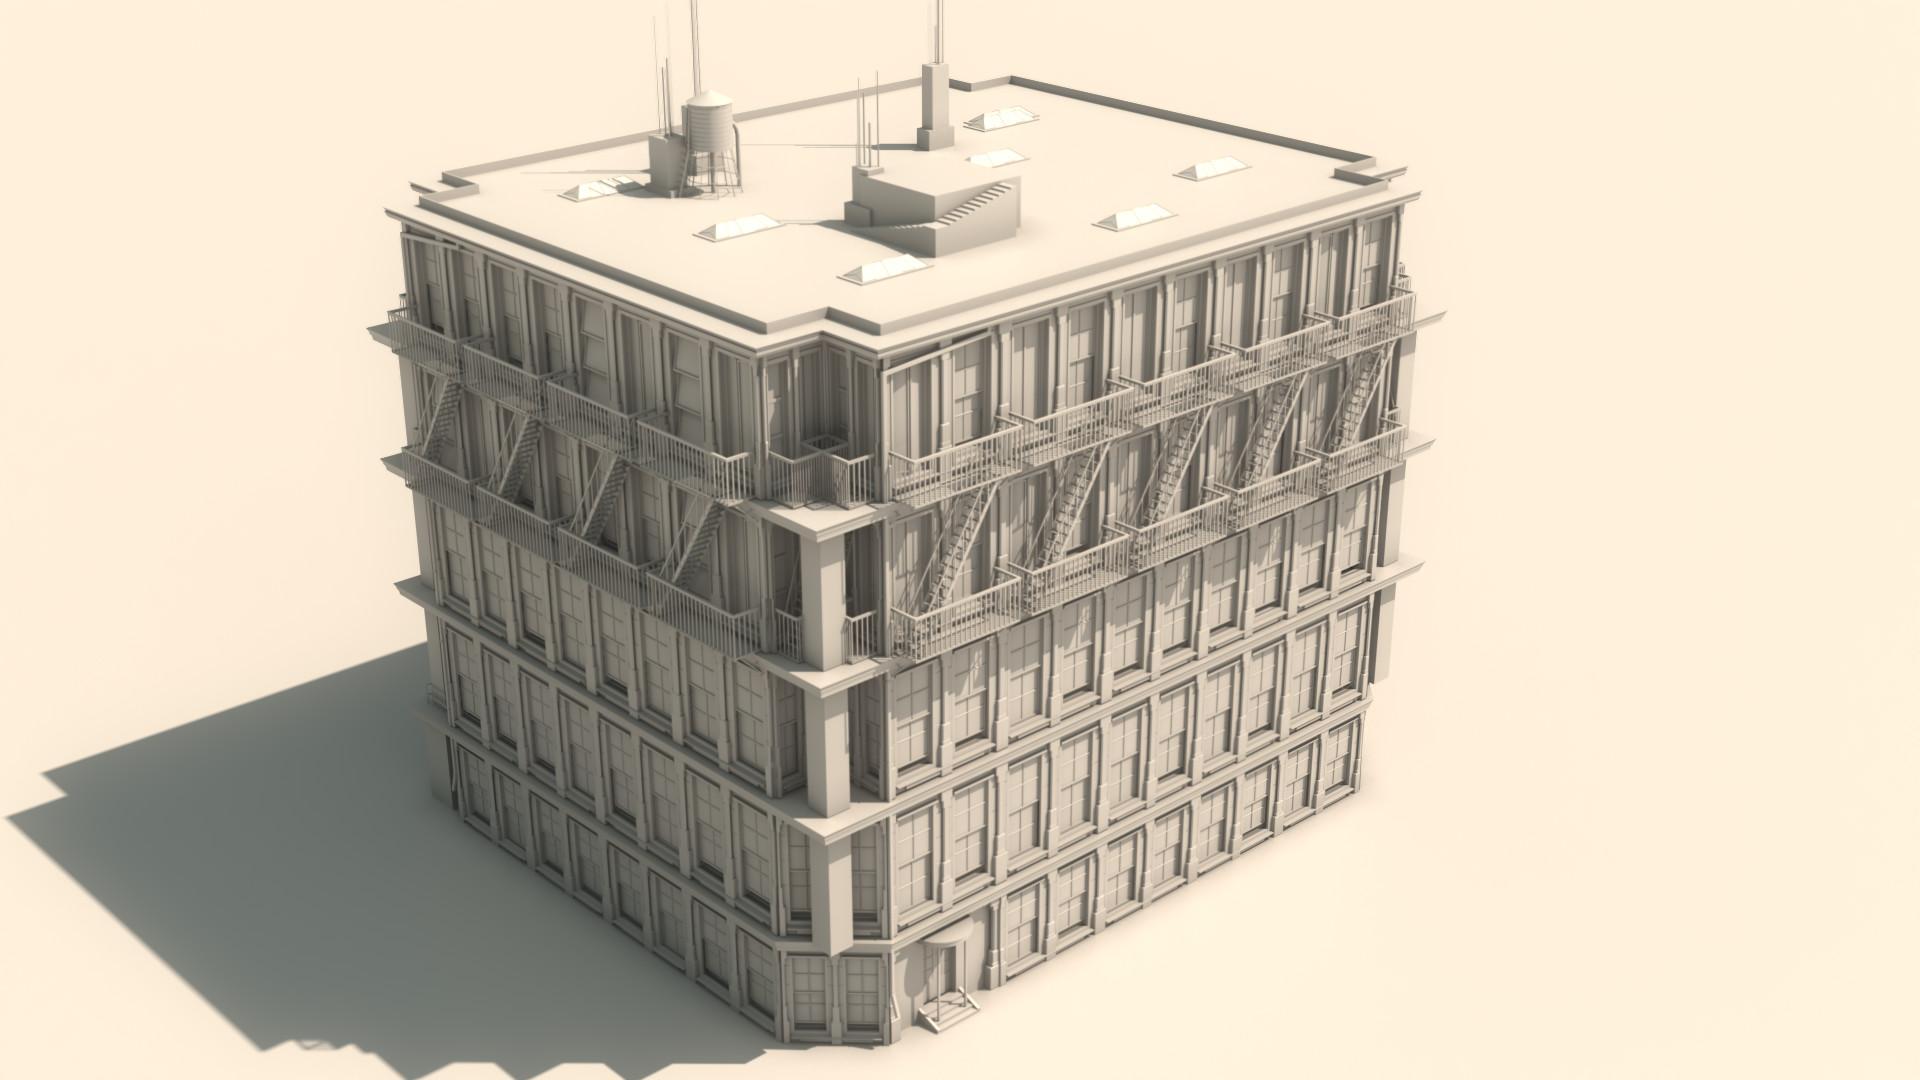 Wayne robson buildingtest